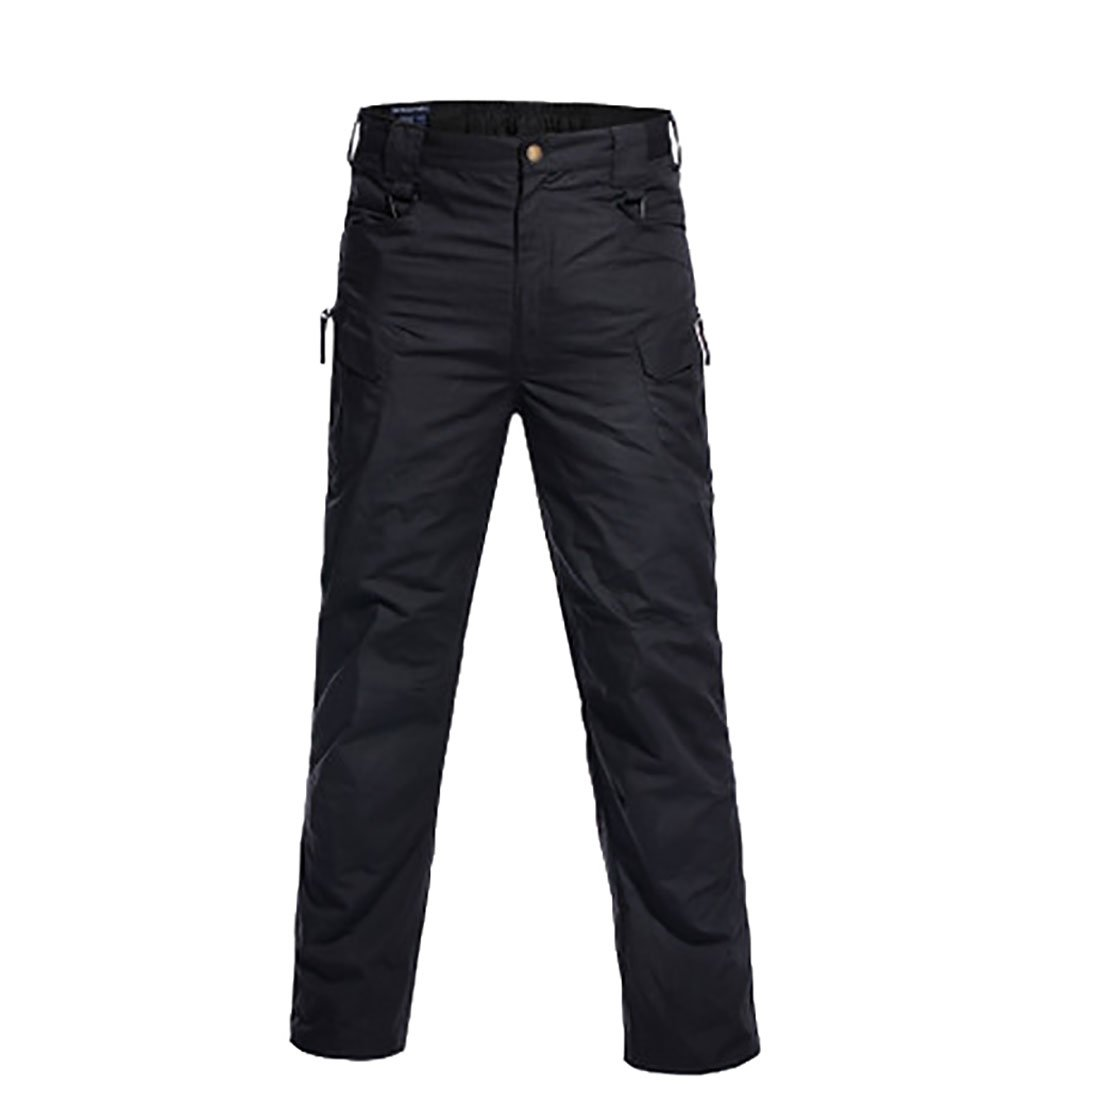 GRMO Men Plus Size Military Multi-Pocket Straight Leg Lightweight Tactical Cargo Pant